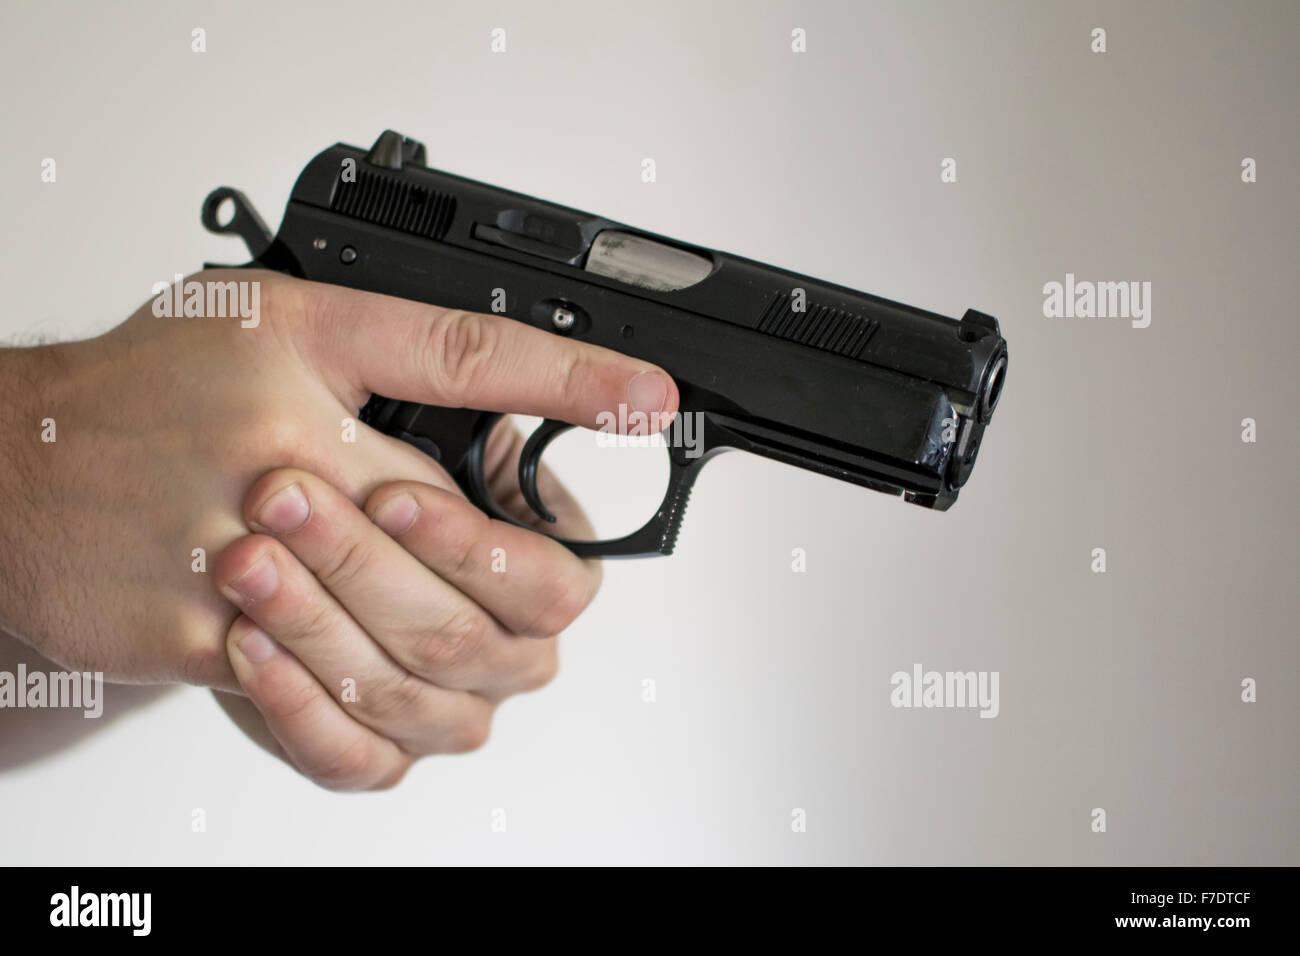 Man drawing handgun in self defense - Stock Image